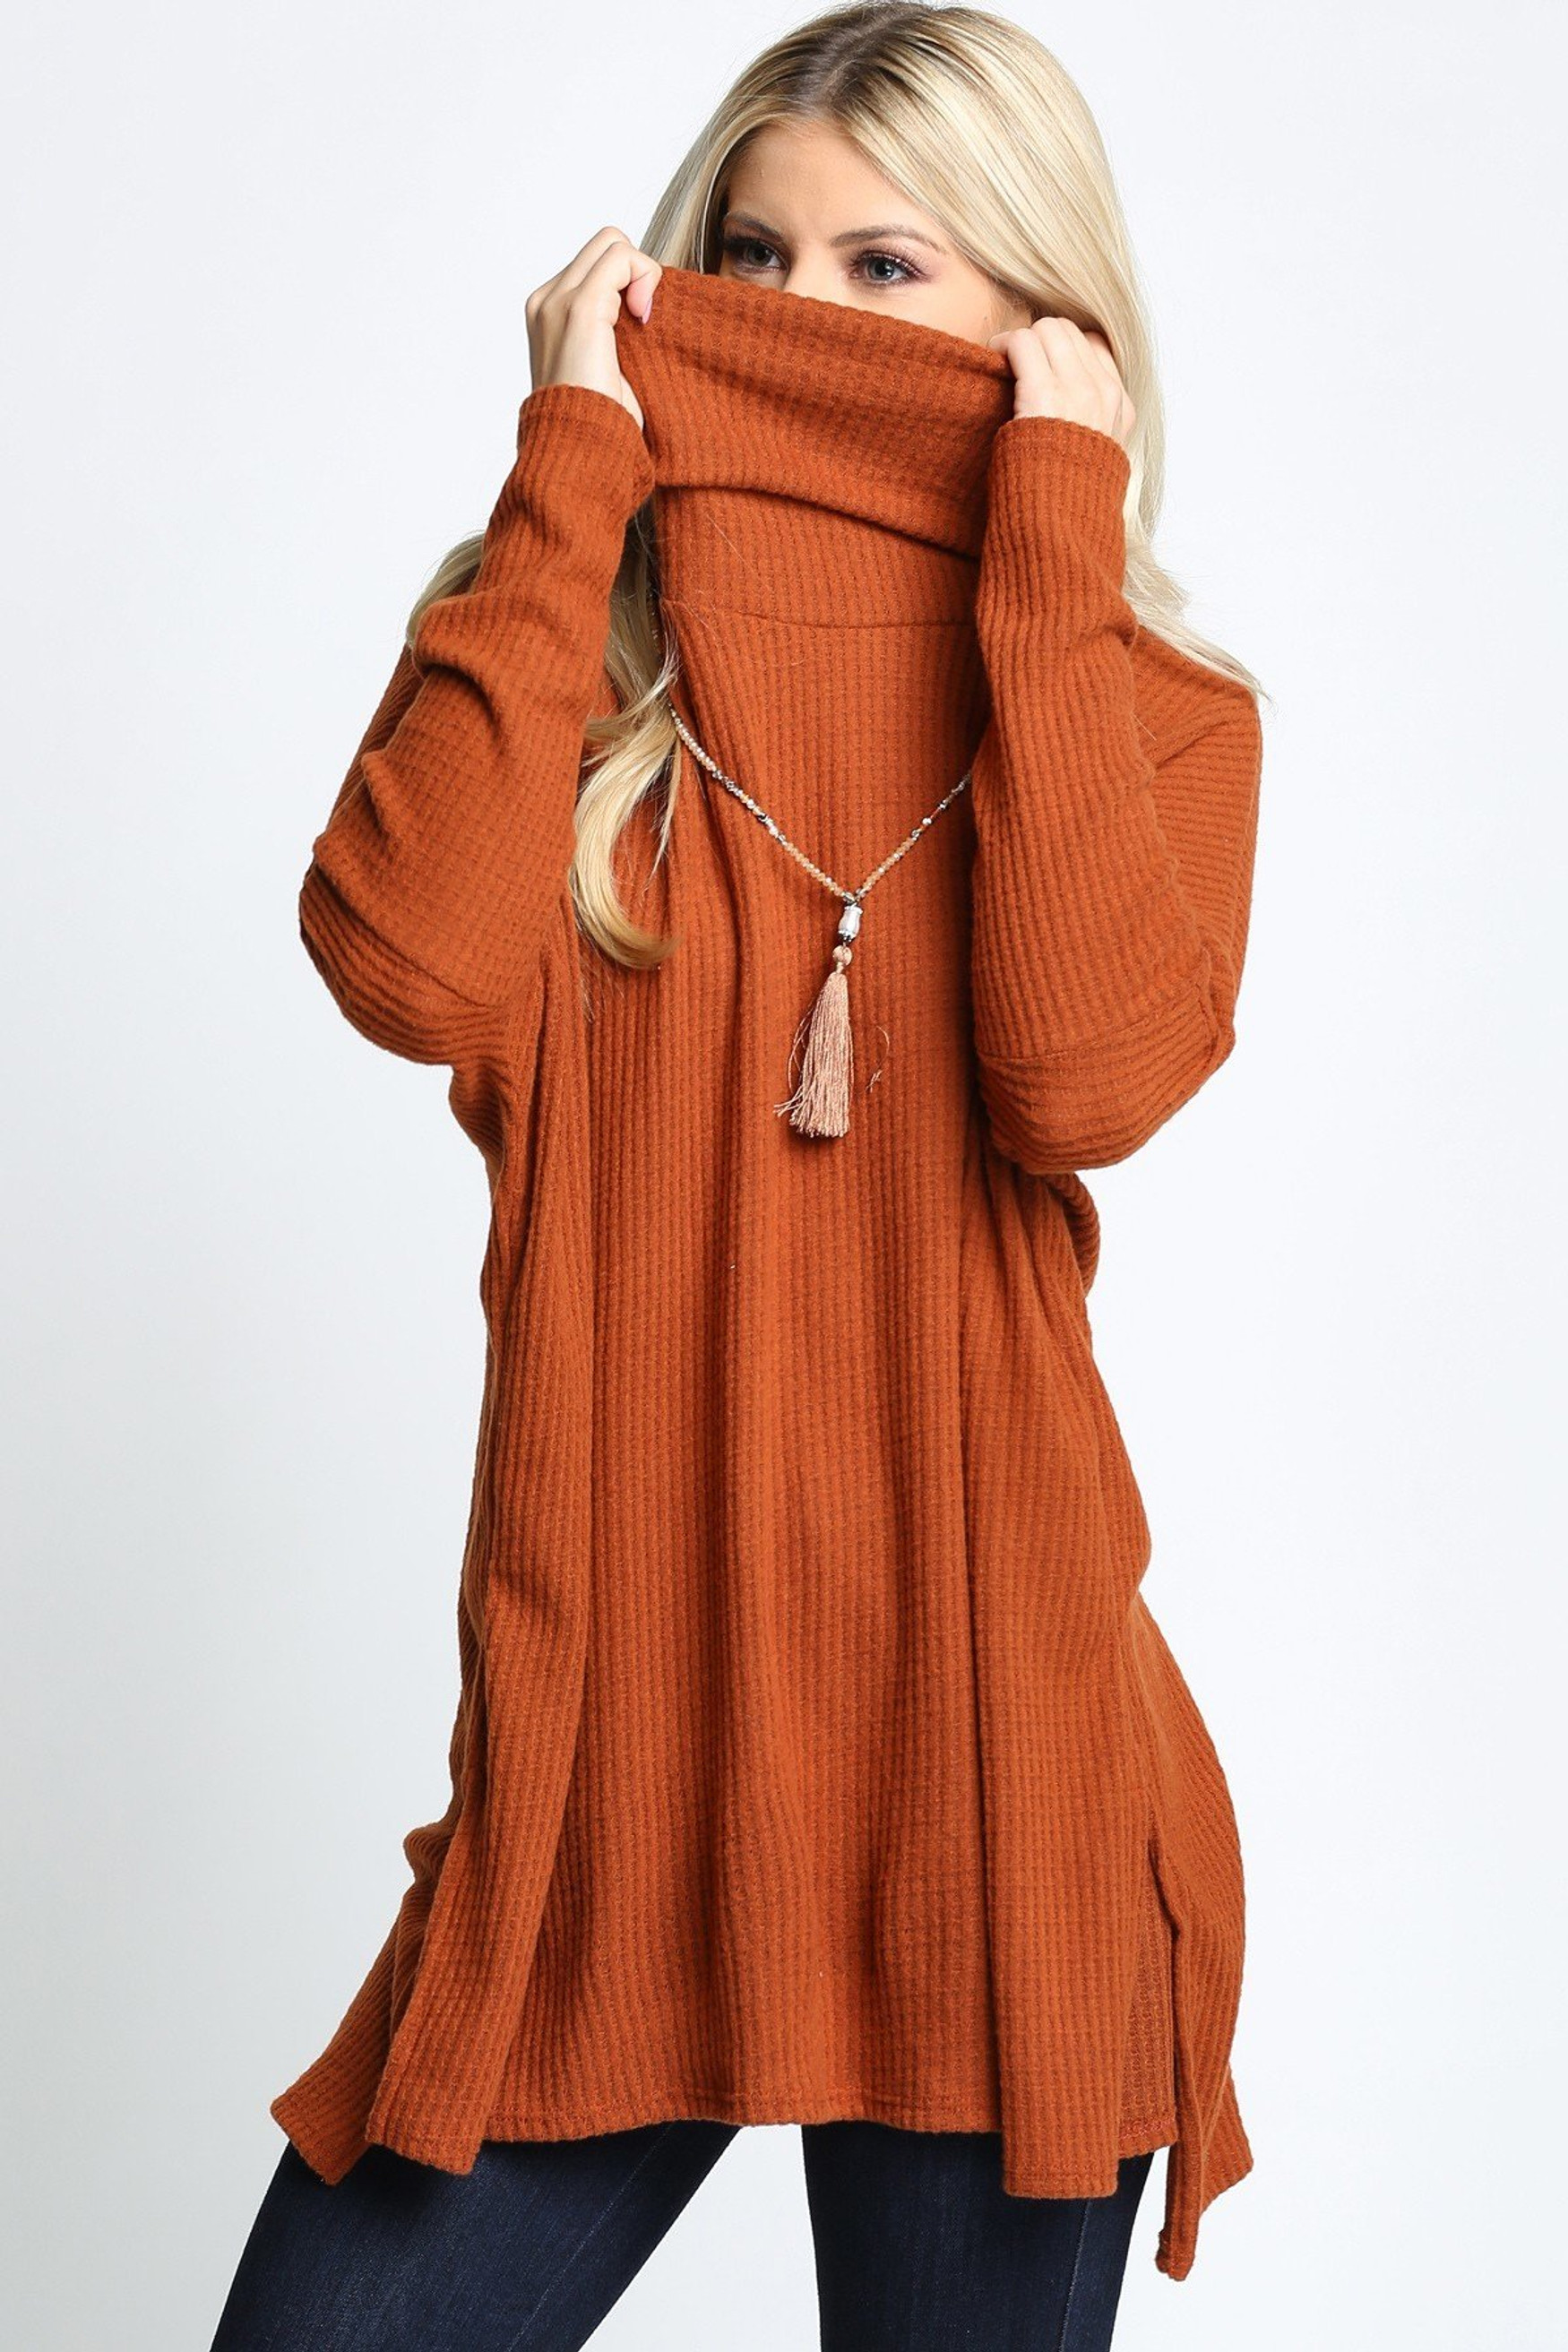 Rust Waffle Knit Cowl Neck Dolman Sleeve Top